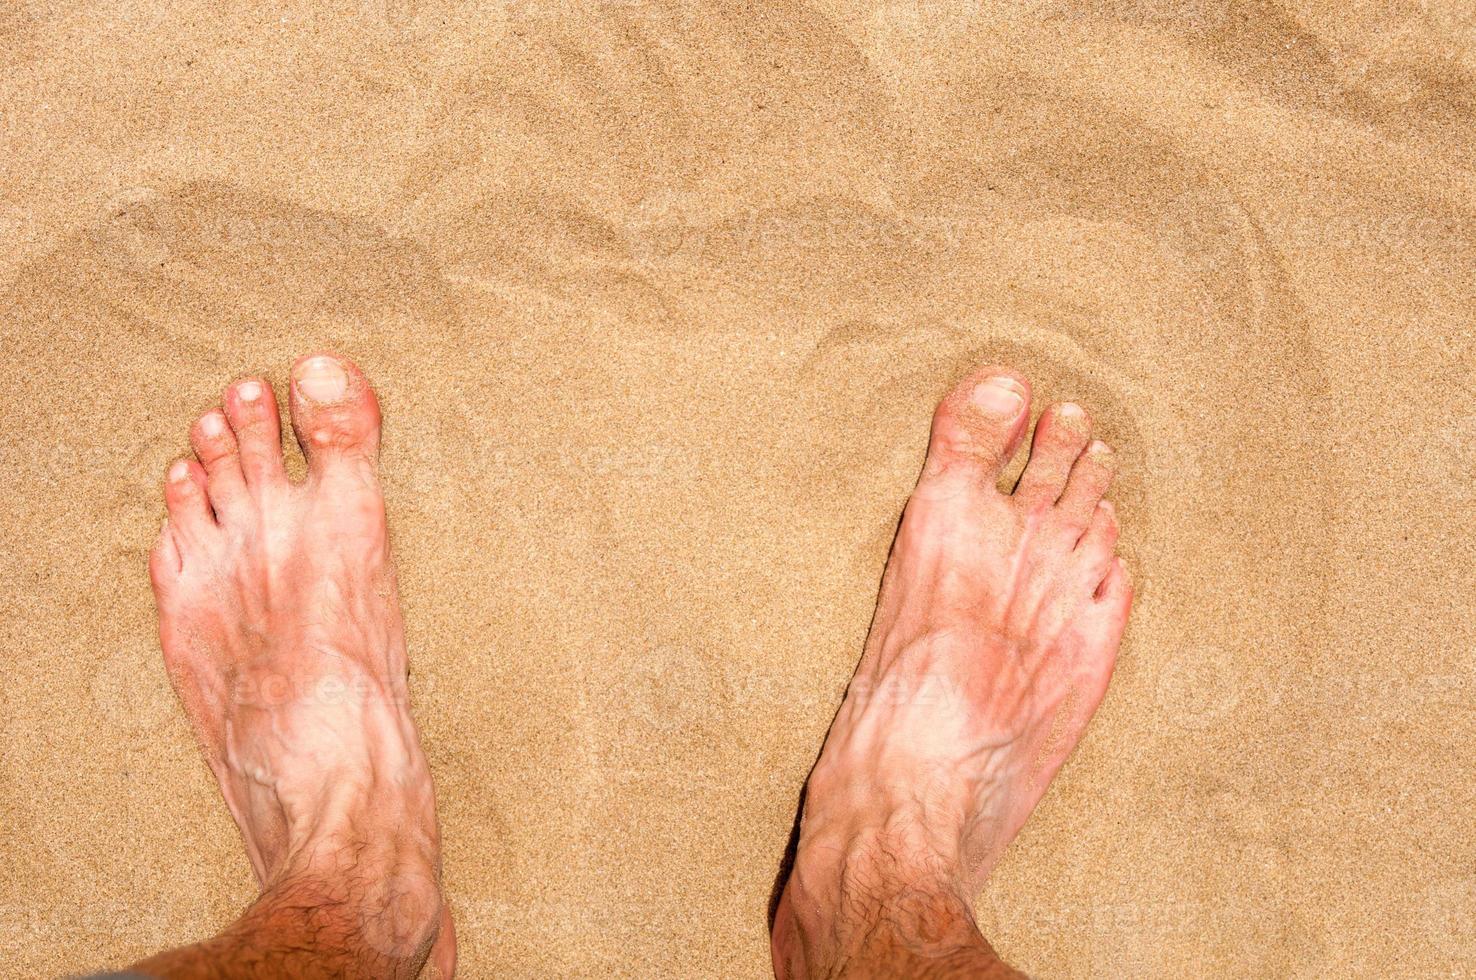 pé masculino na areia foto